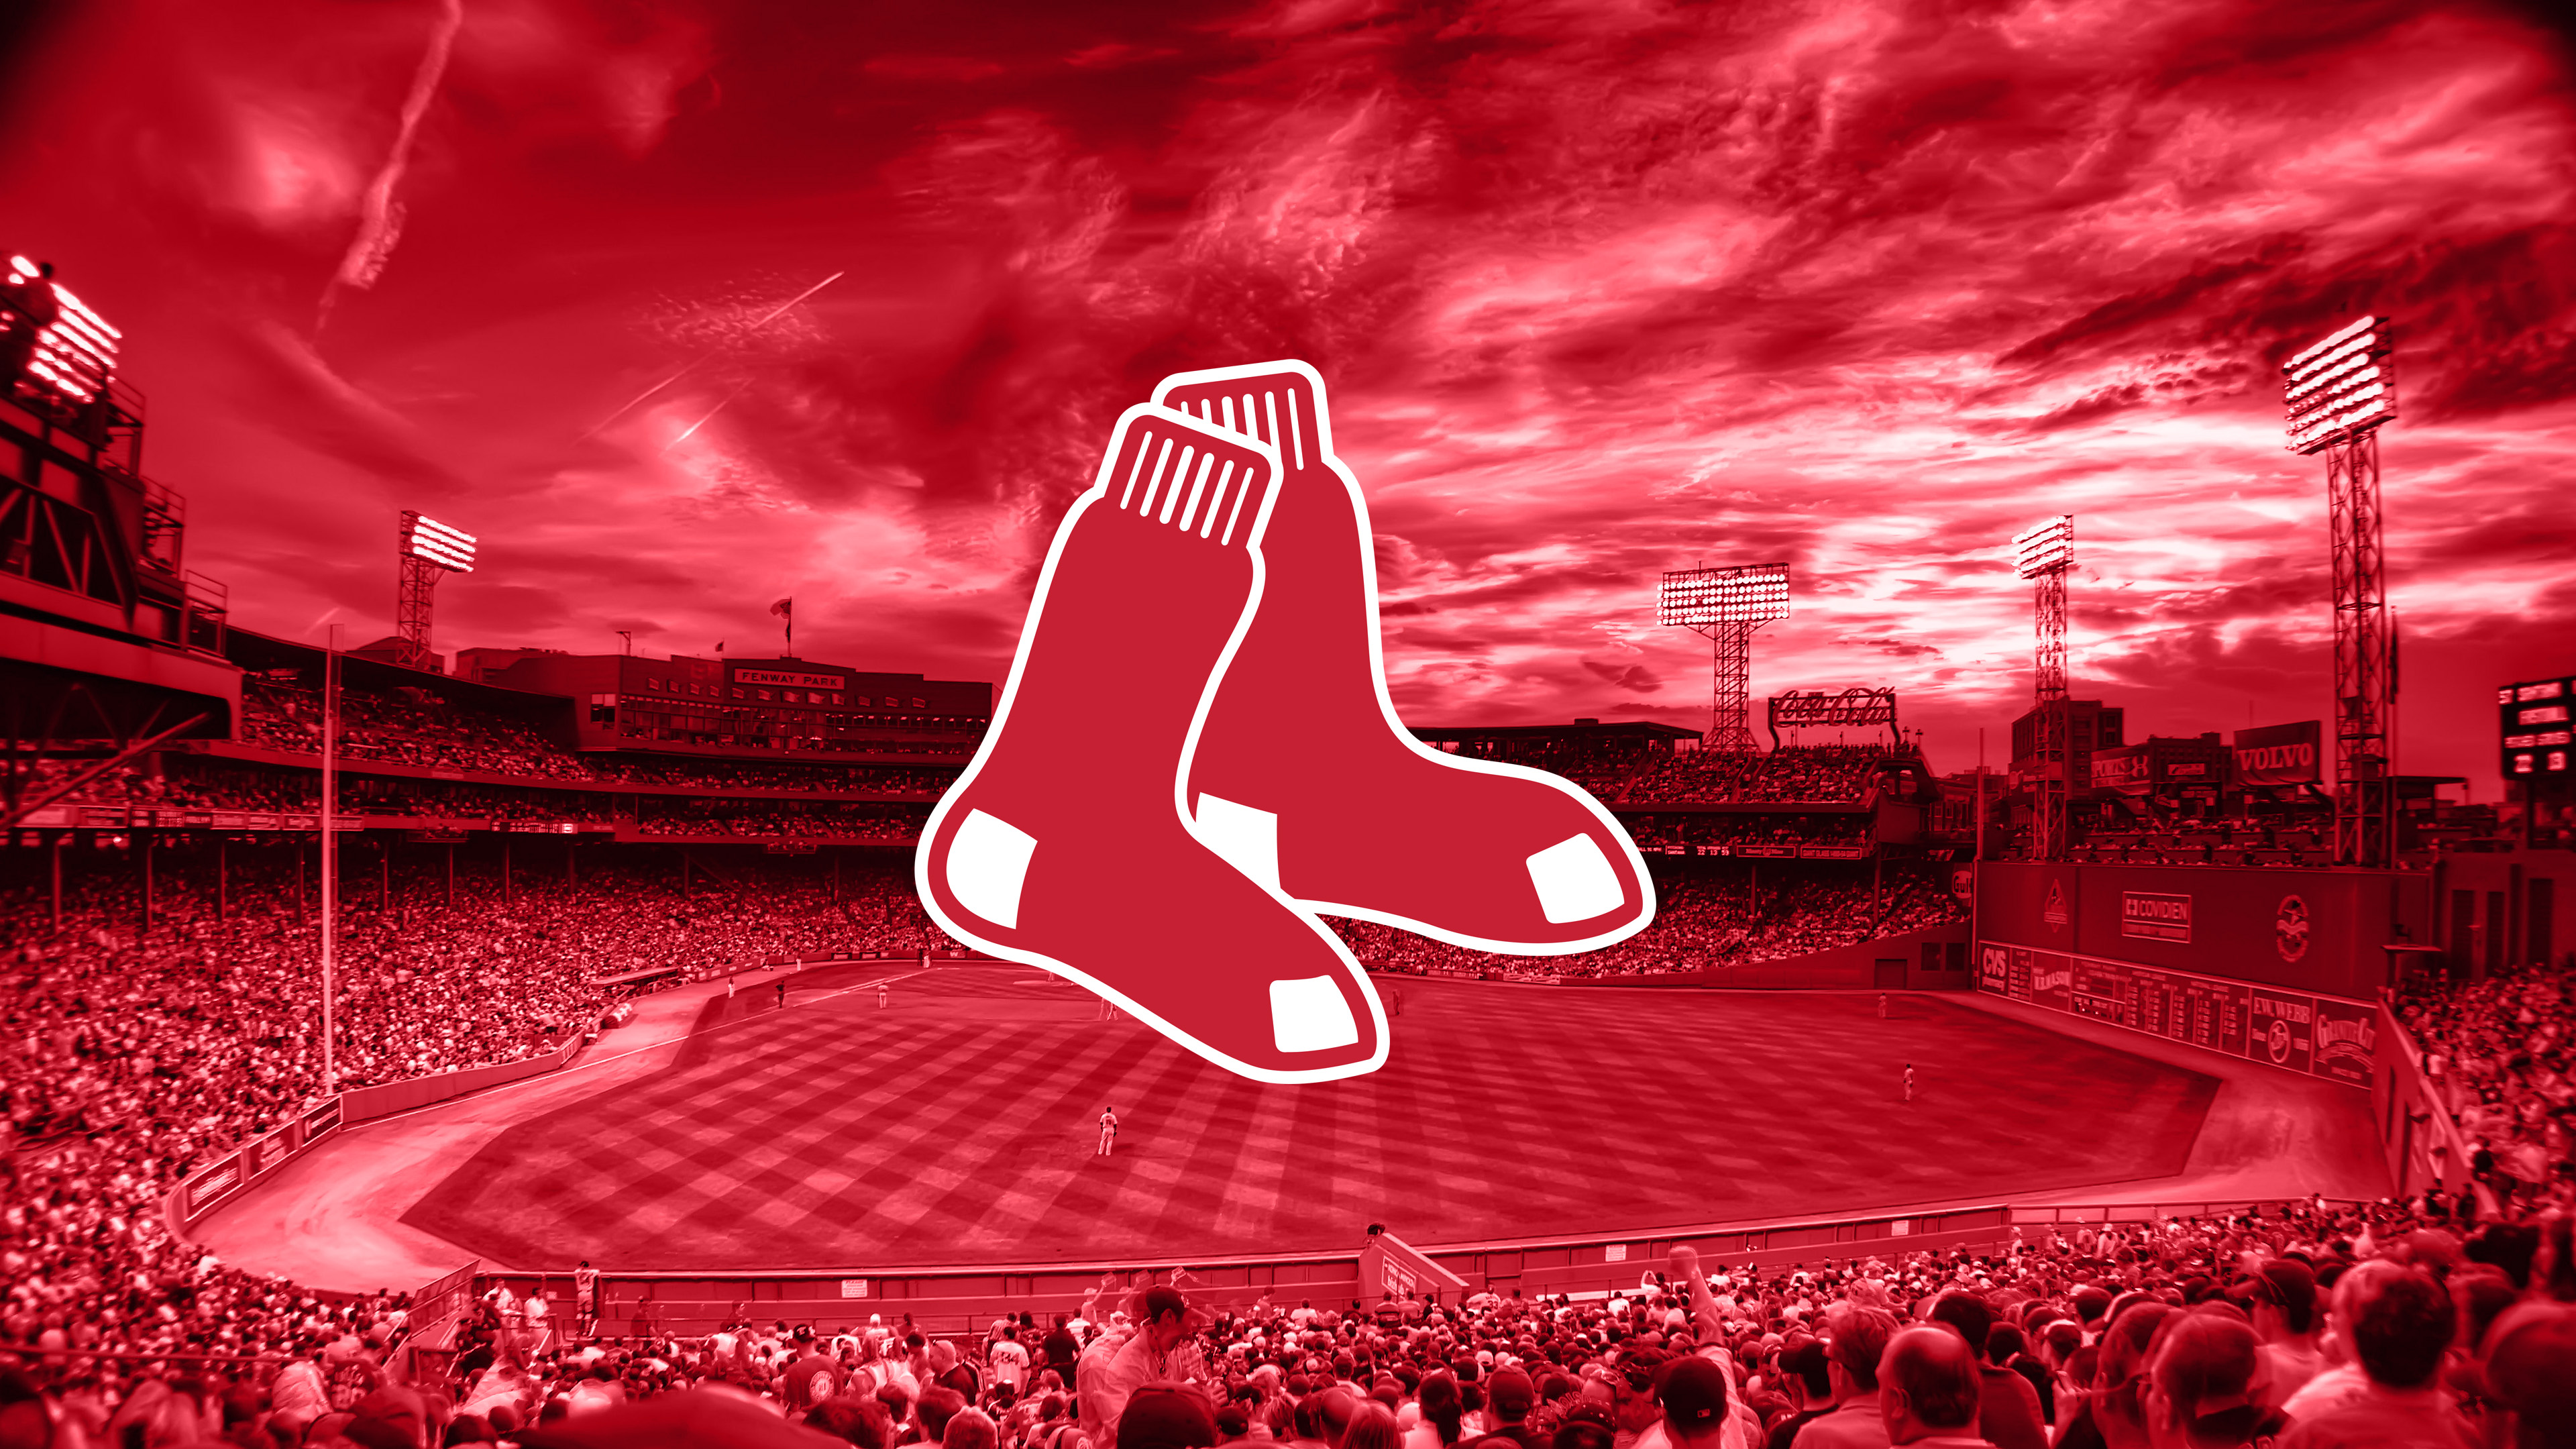 Boston Red Sox Wallpaper Download Clip Art Clip 3840x2160